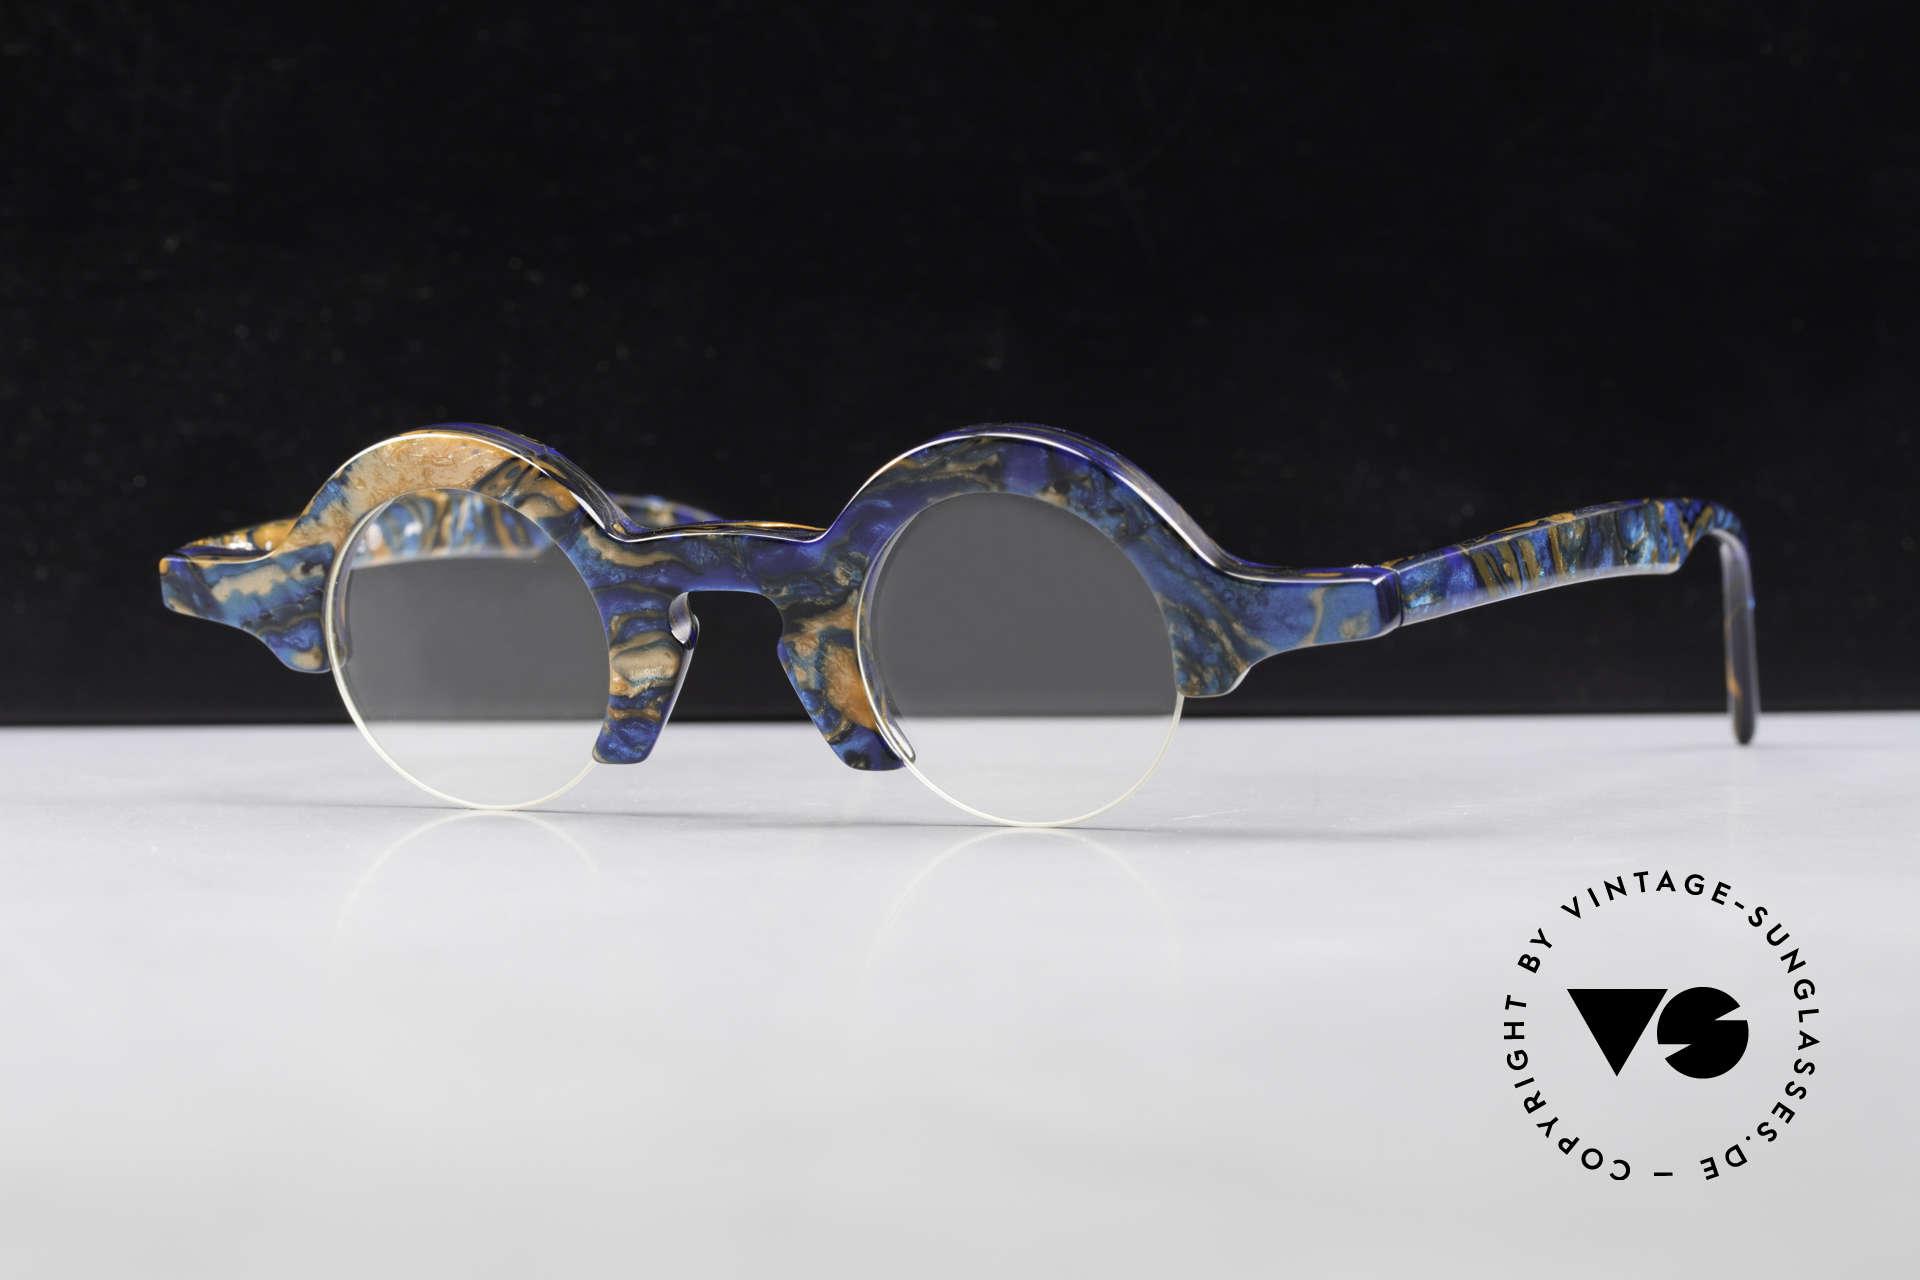 Proksch's A2 Futuristic Round 90's Eyeglasses, Size: medium, Made for Men and Women